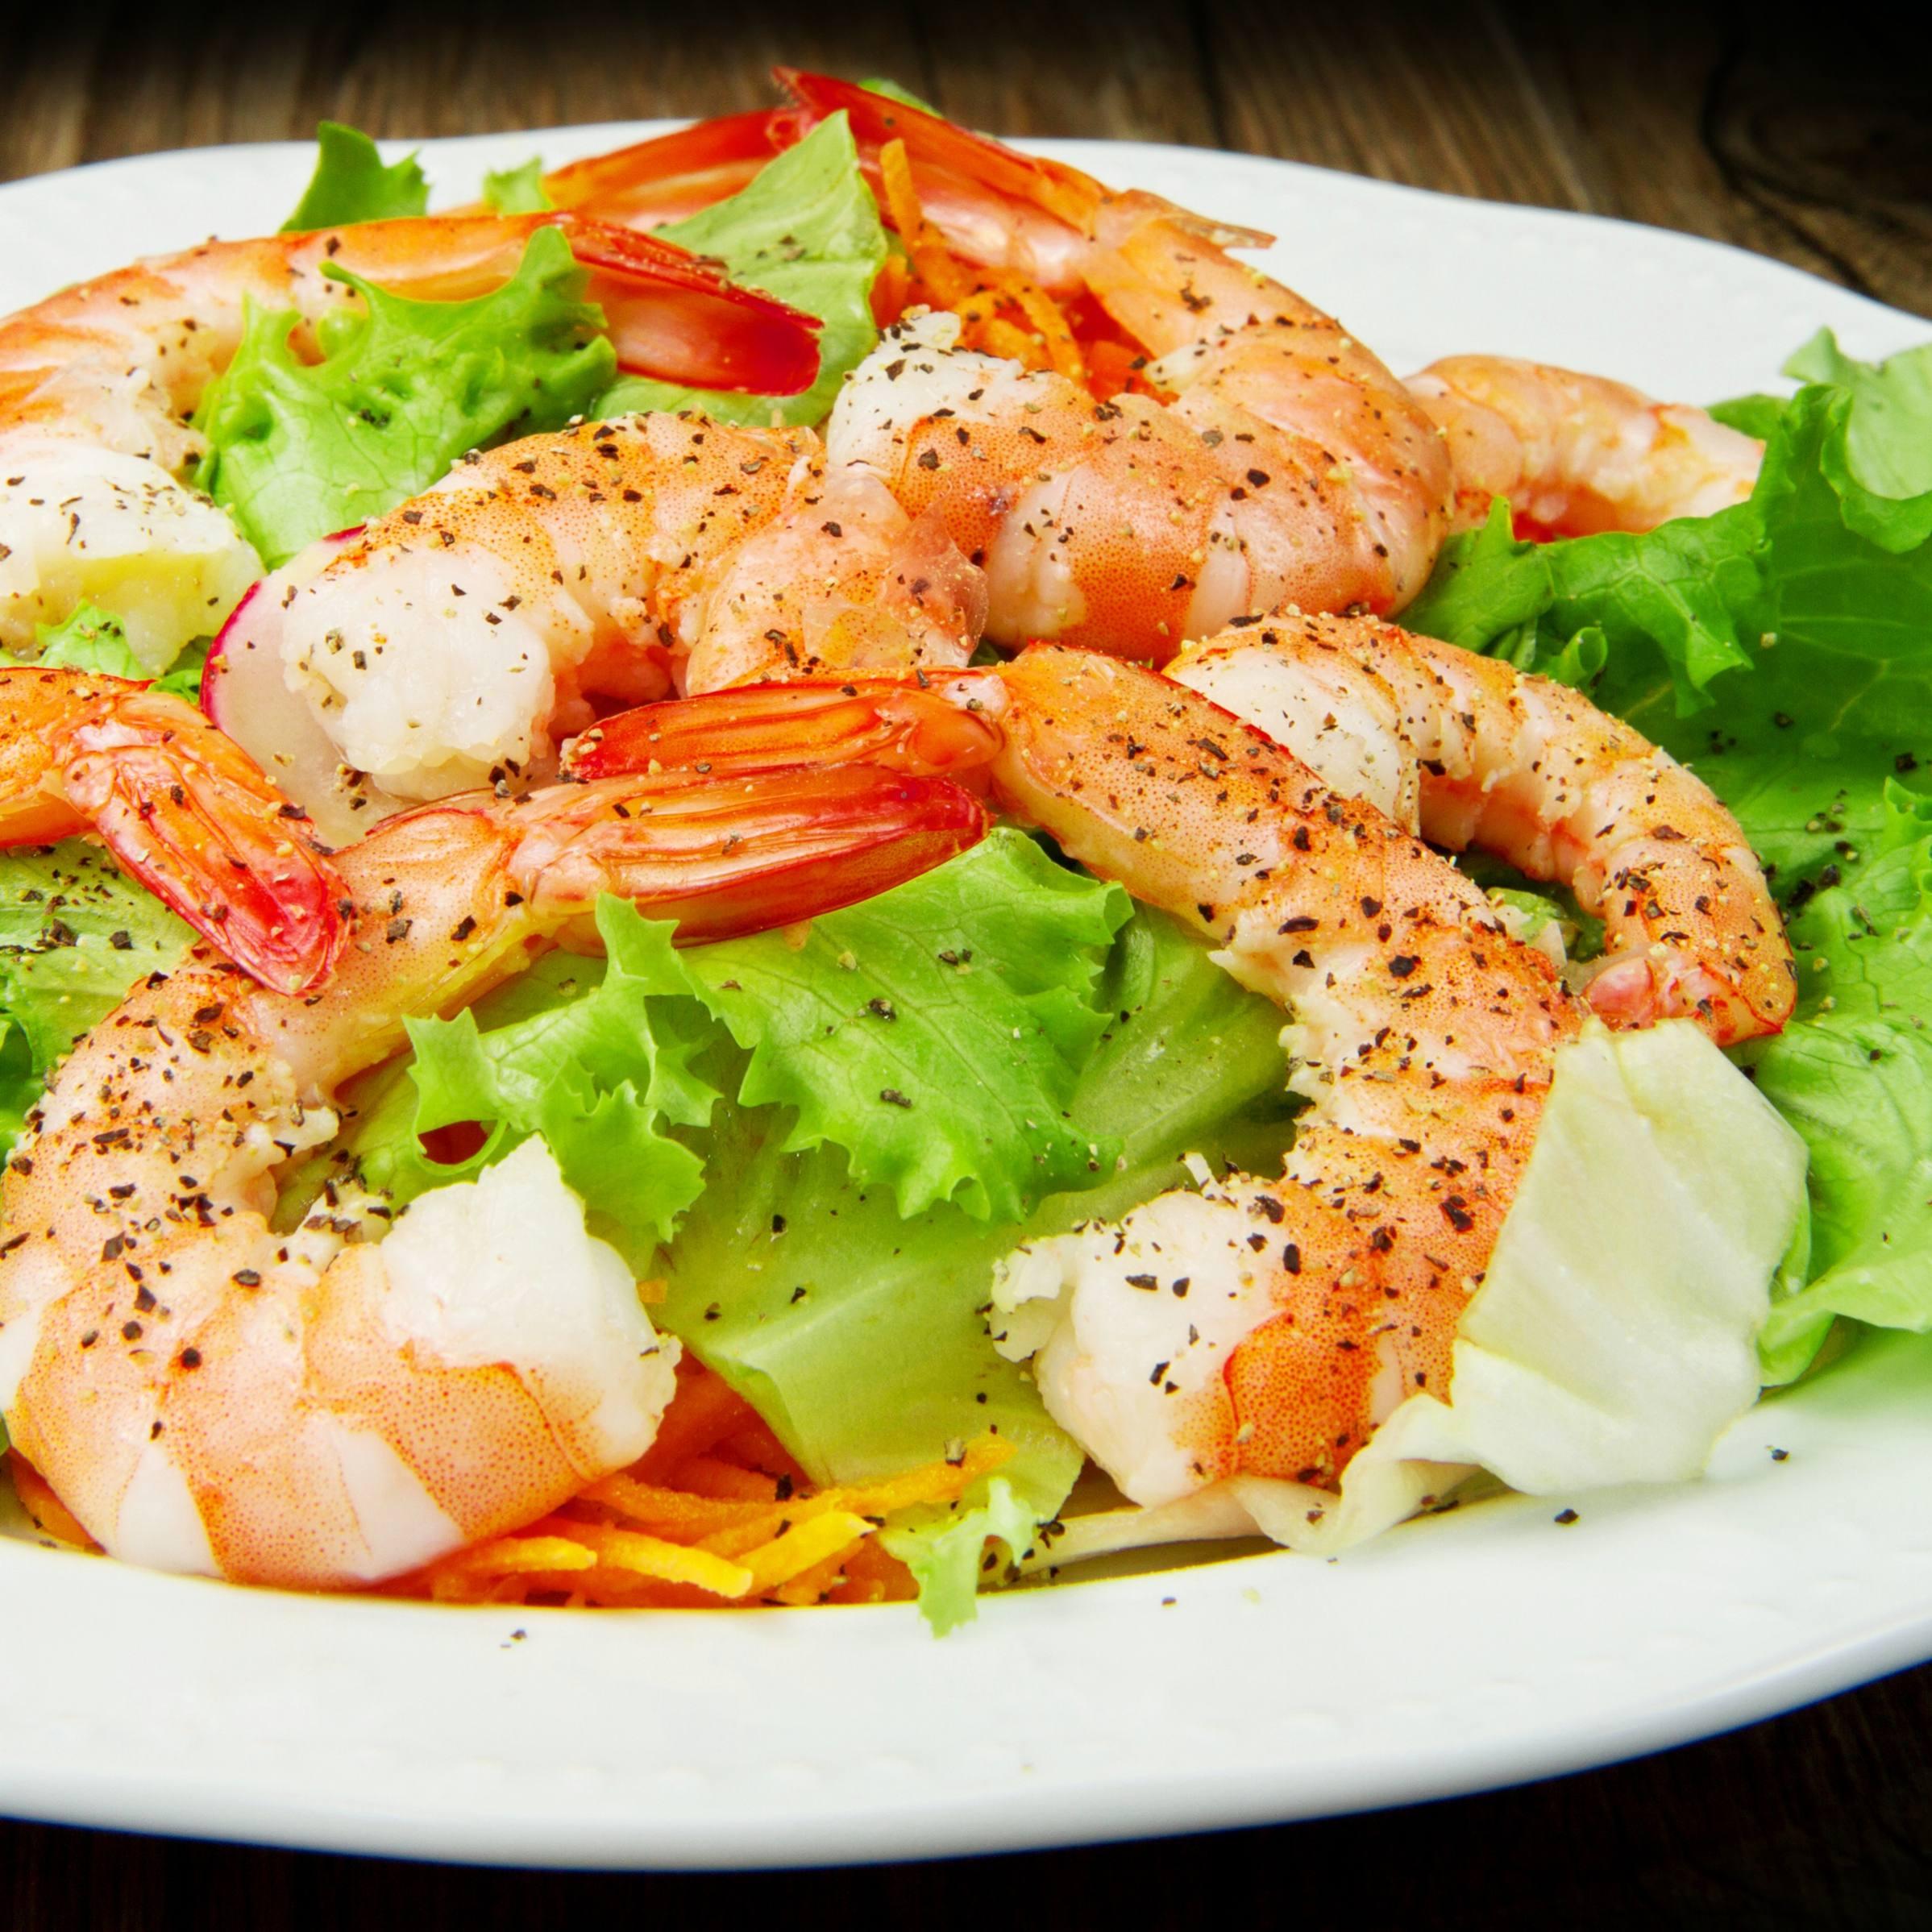 fresh green lettuce salad with shrimp (Omega-3 fatty acids) for good cholesterol (HDL)